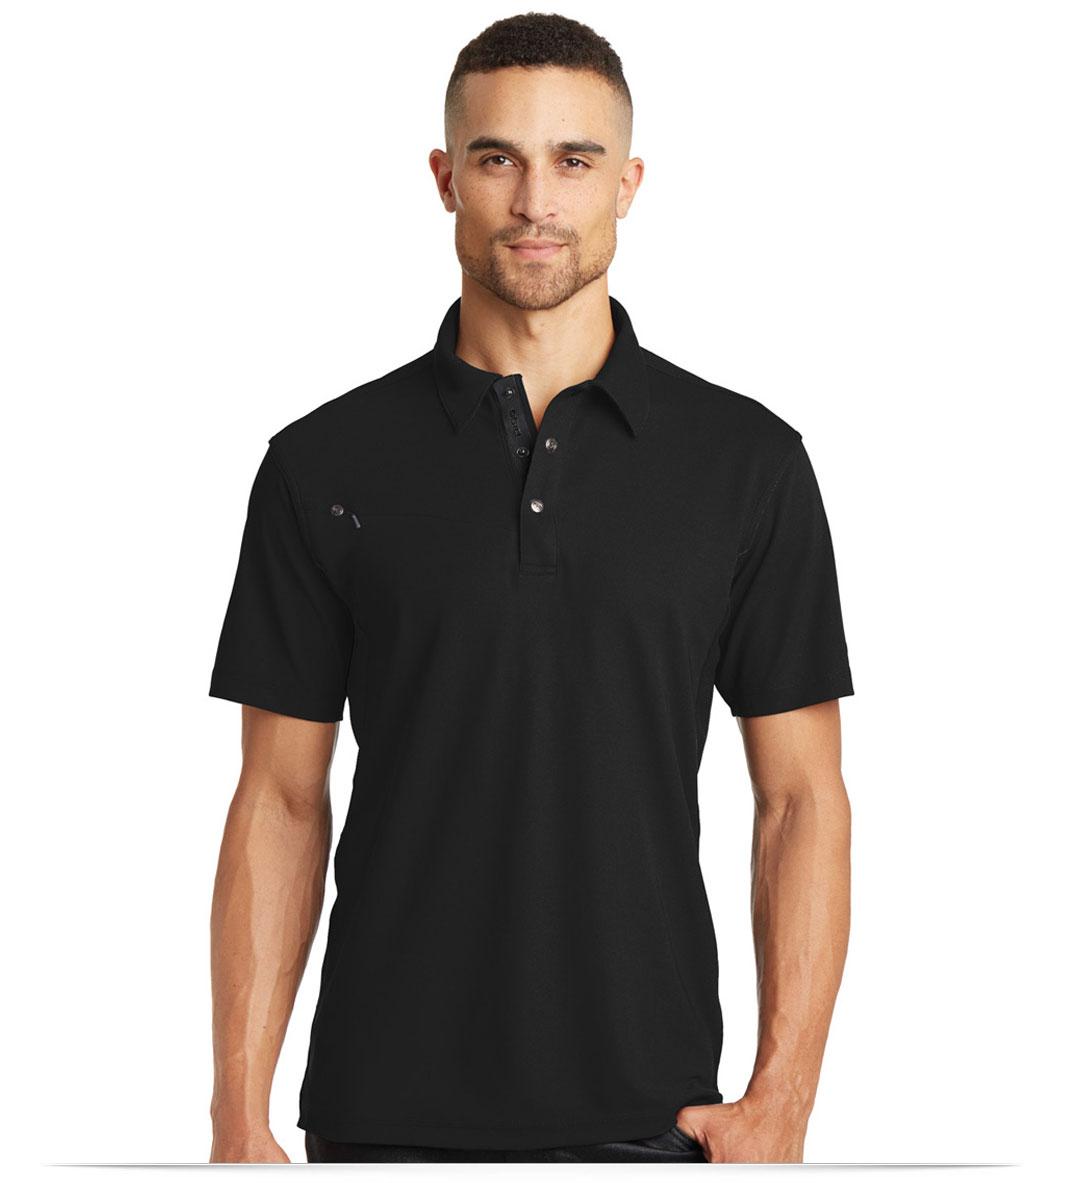 Design embroidered custom logo ogio polo shirt online for Name brand golf shirts